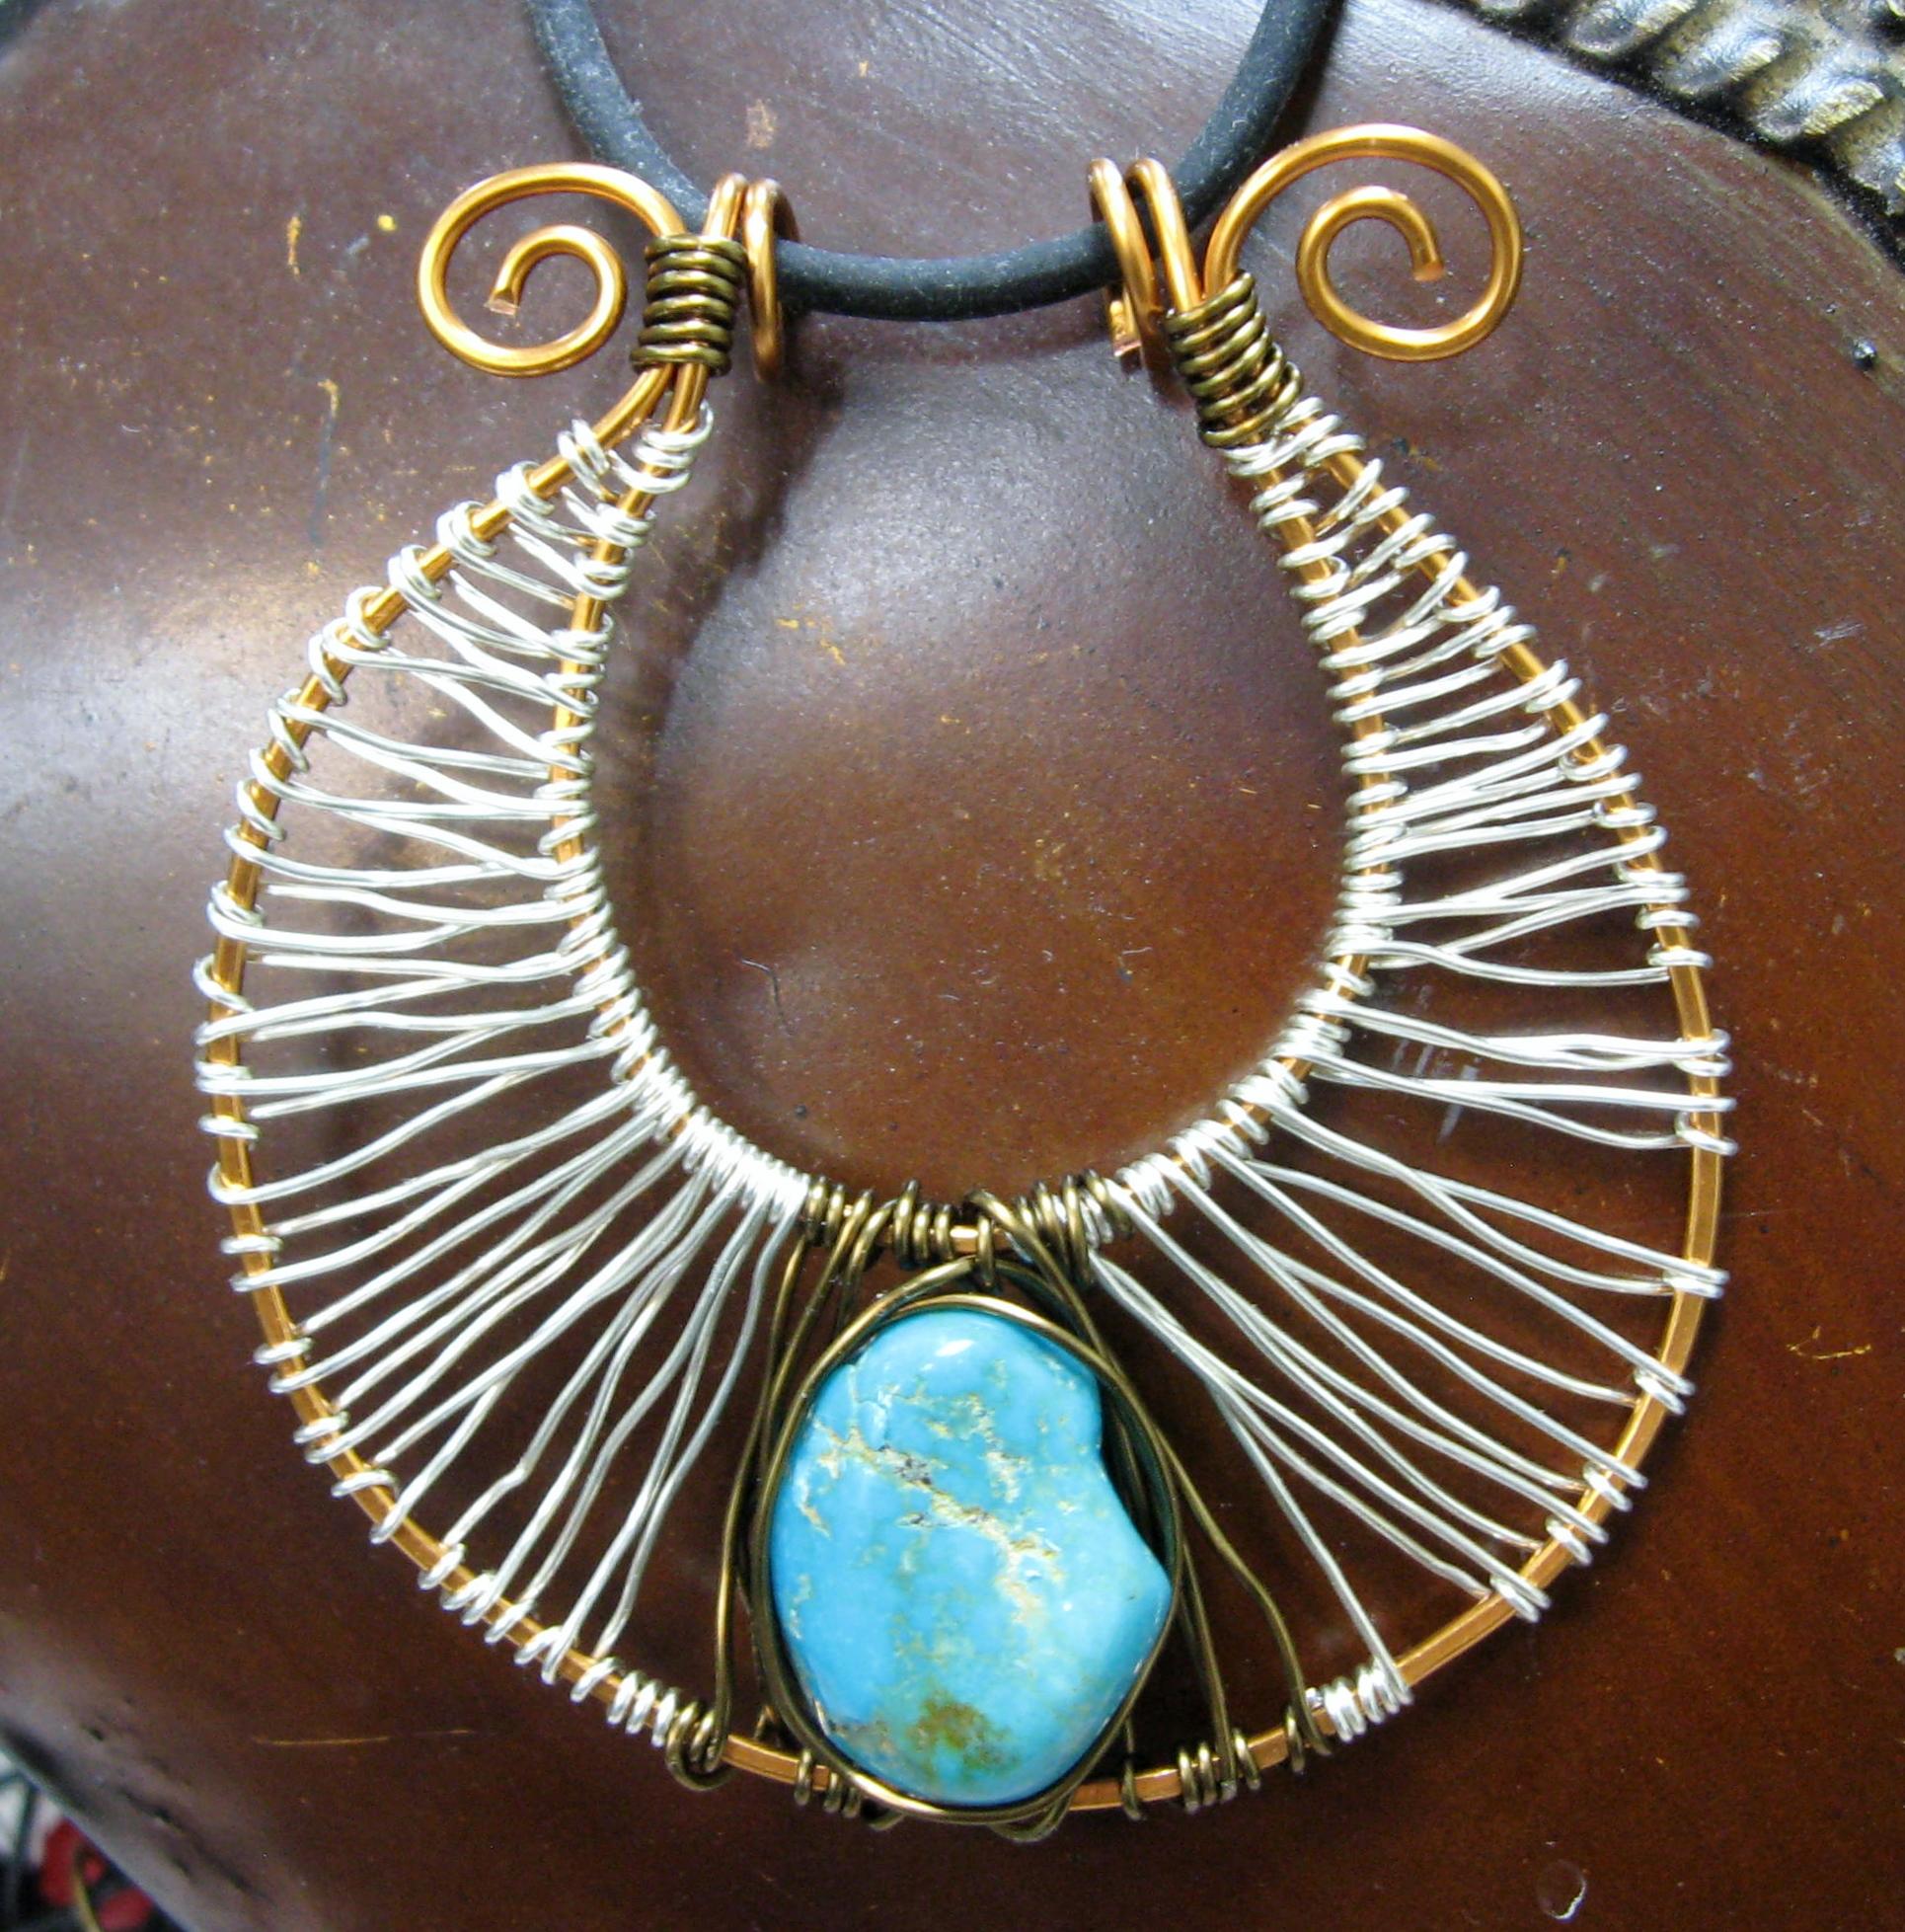 Horseshoe pendant